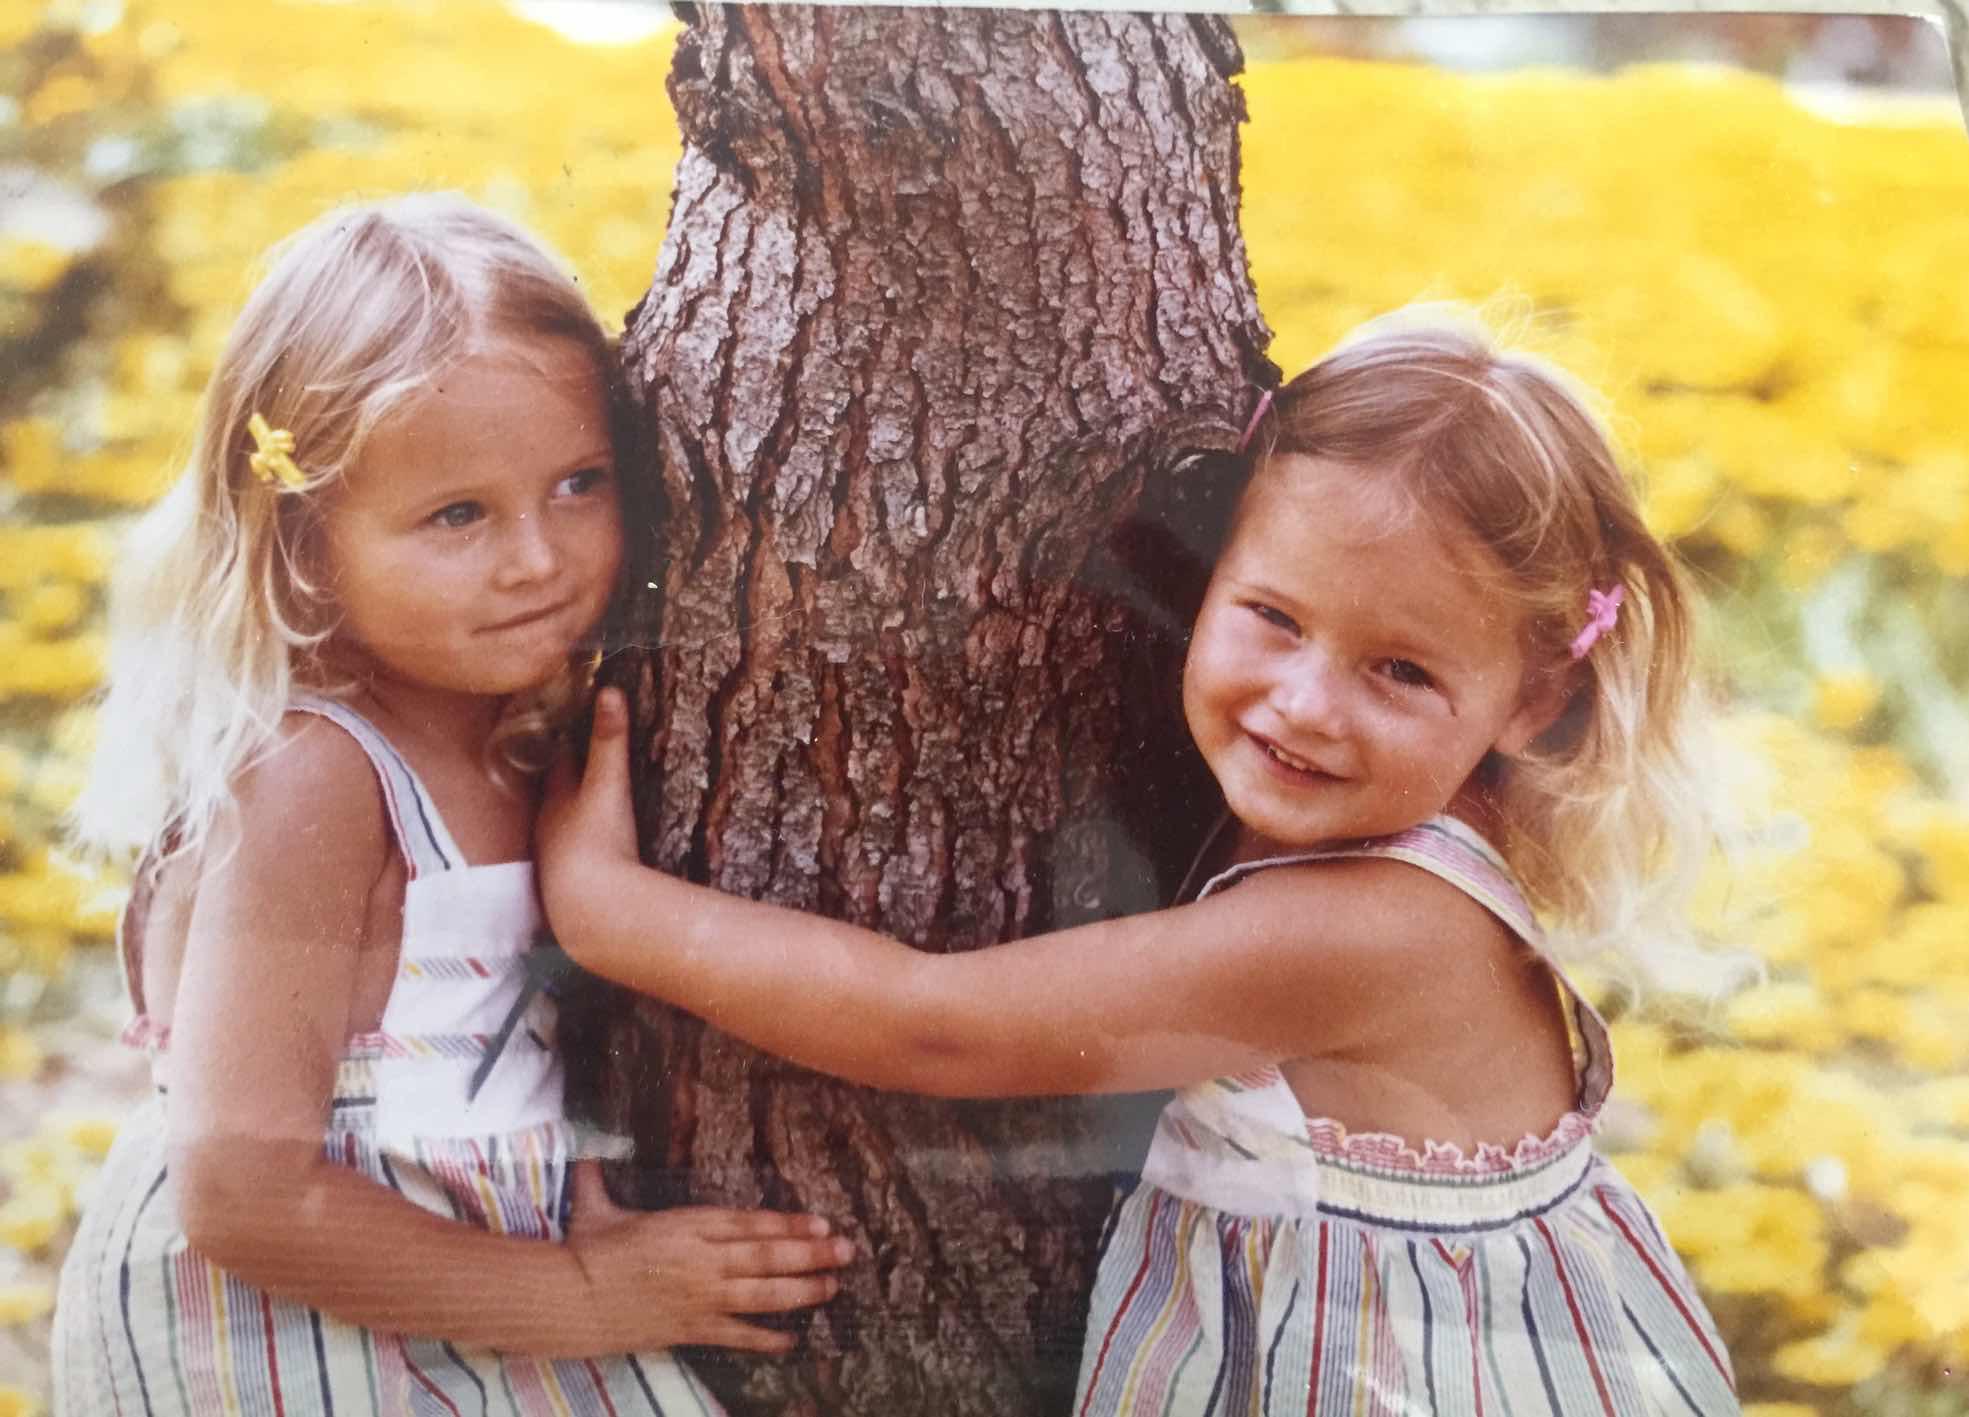 identical twin girls hugging a tree